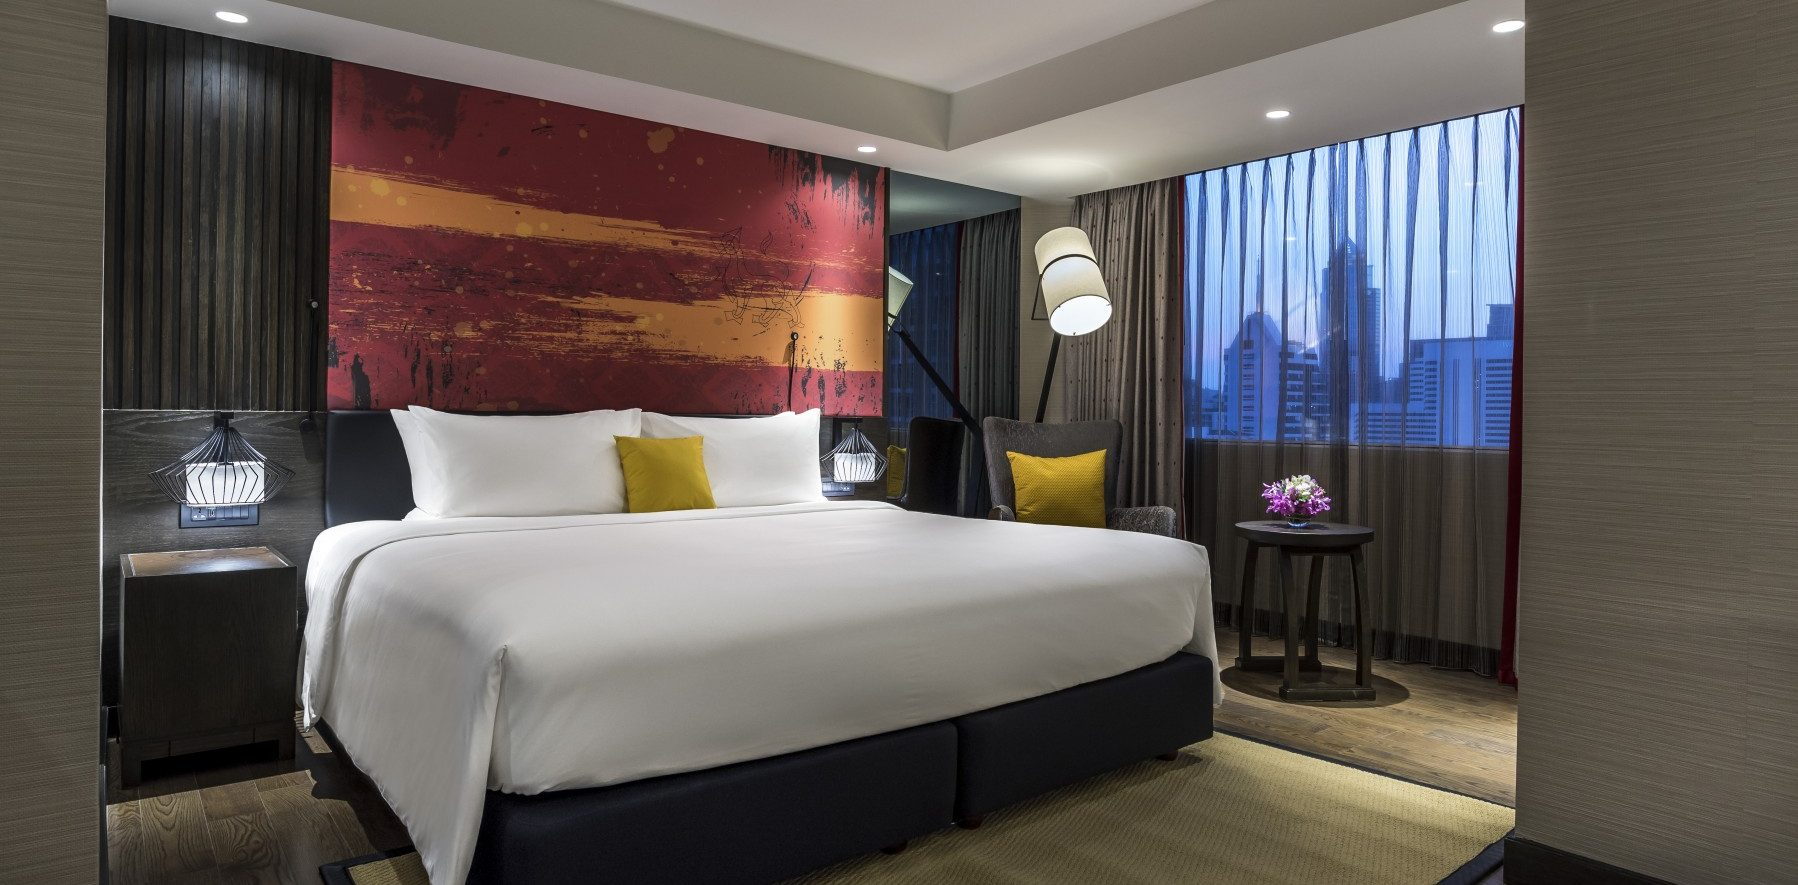 Deluxe Room at Mercure Bangkok Sukhumvit 11